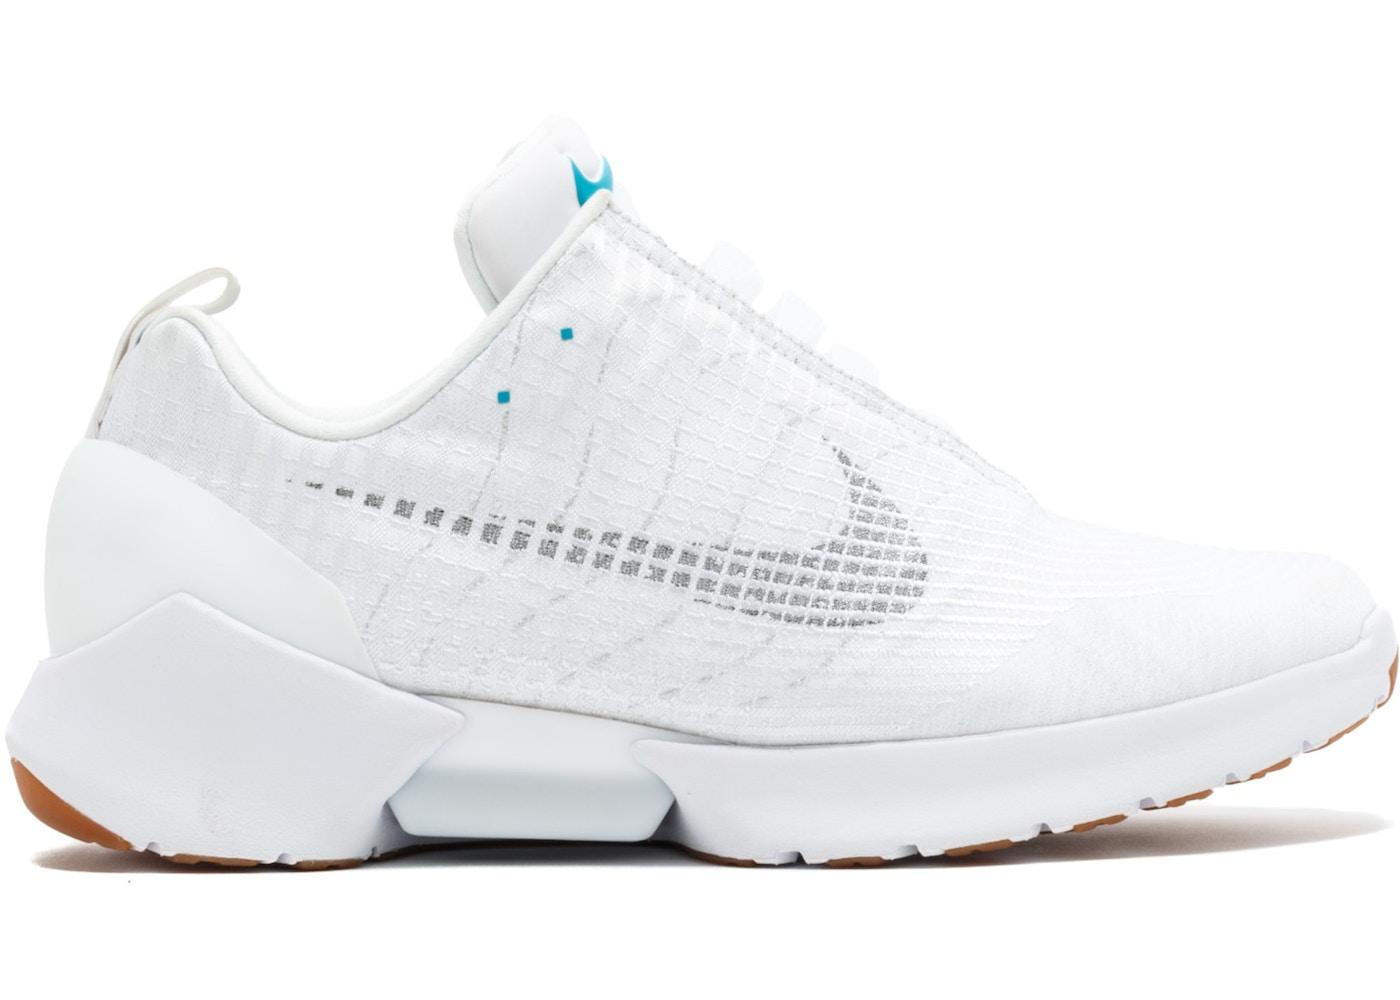 reputable site 4c466 96acf Nike HyperAdapt 1.0 White